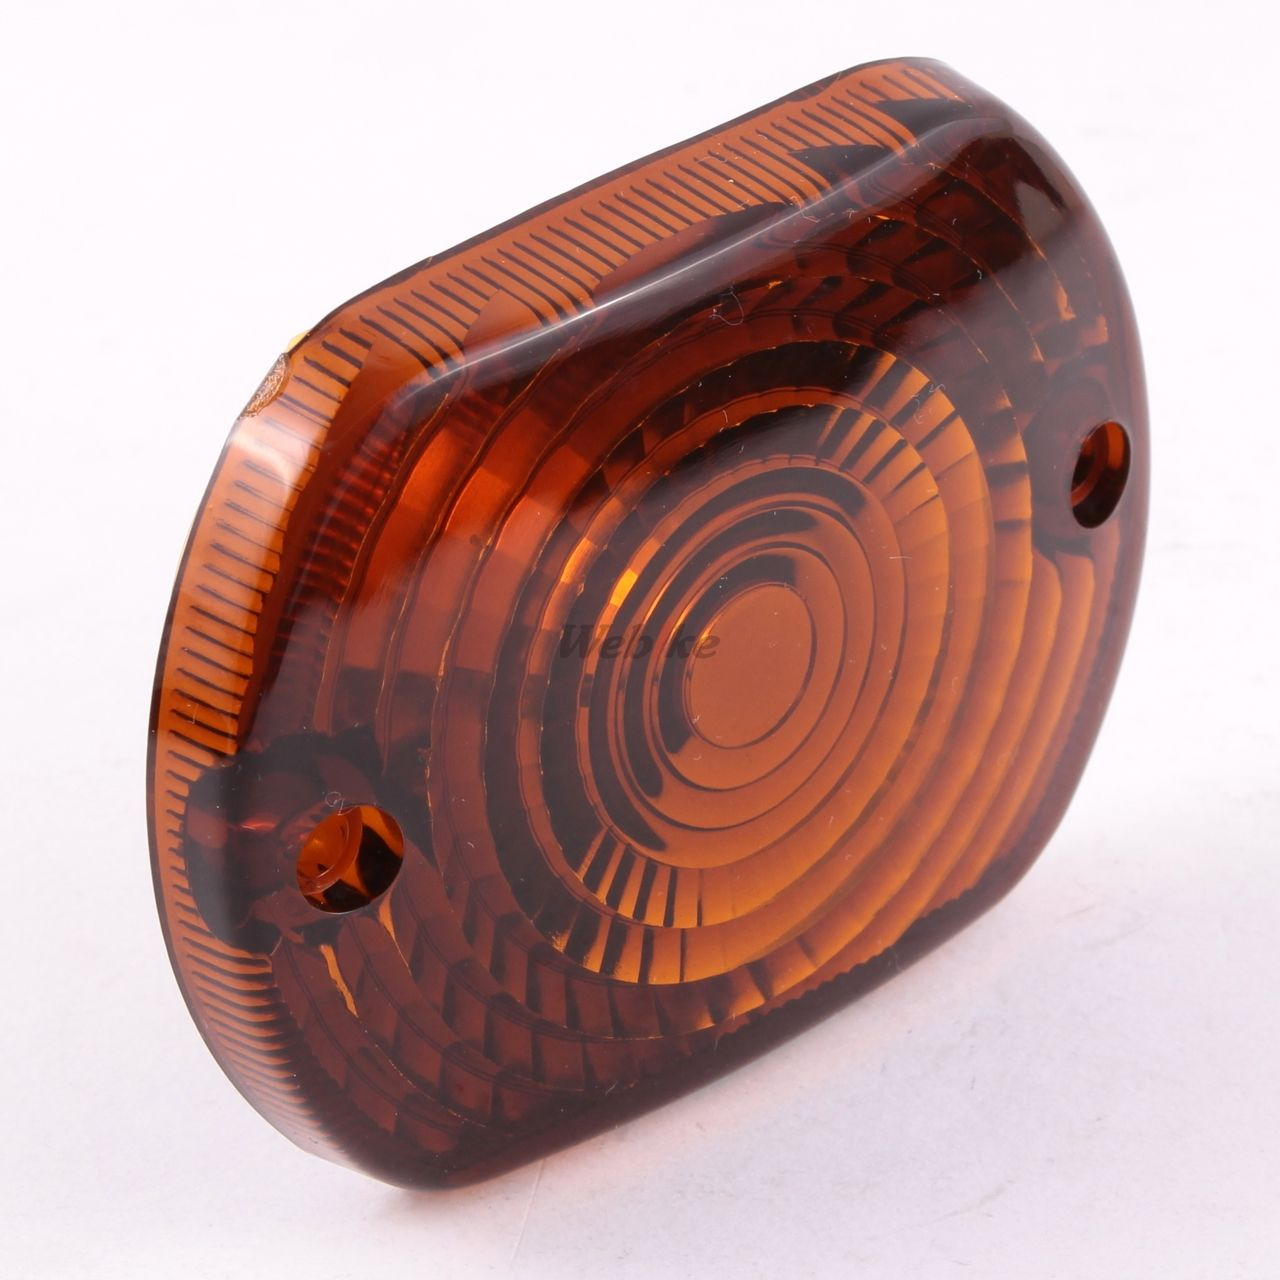 【PMC】FX Type 方向燈 只有燈殼 (橙色) - 「Webike-摩托百貨」